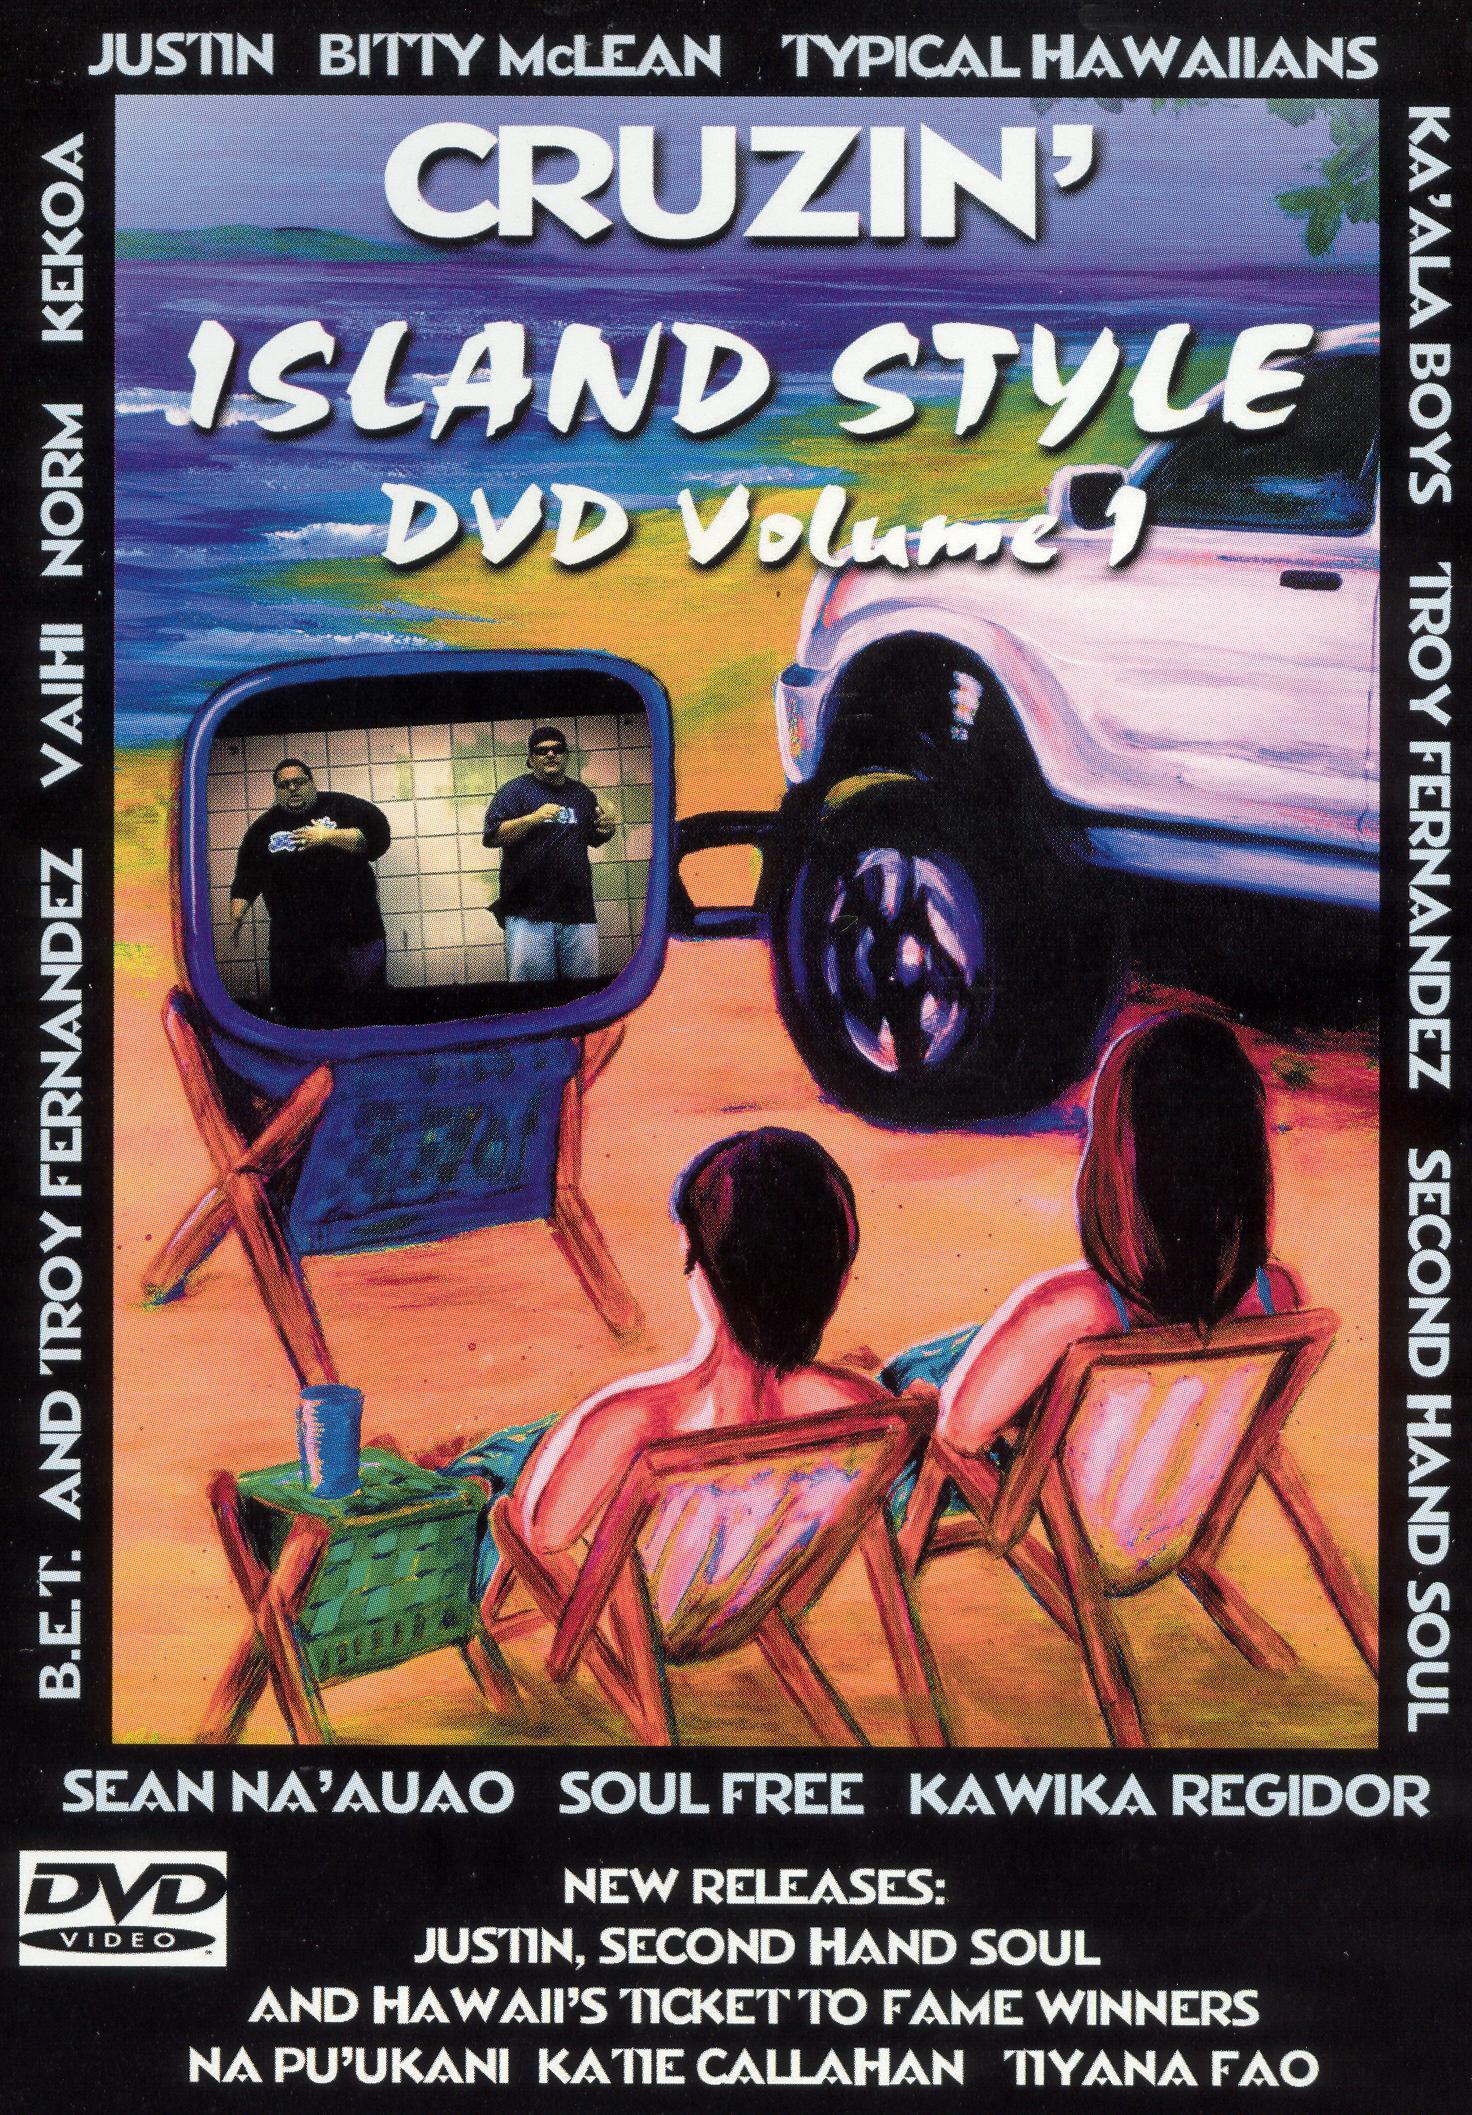 Cruzin' Island Style, Vol. 1